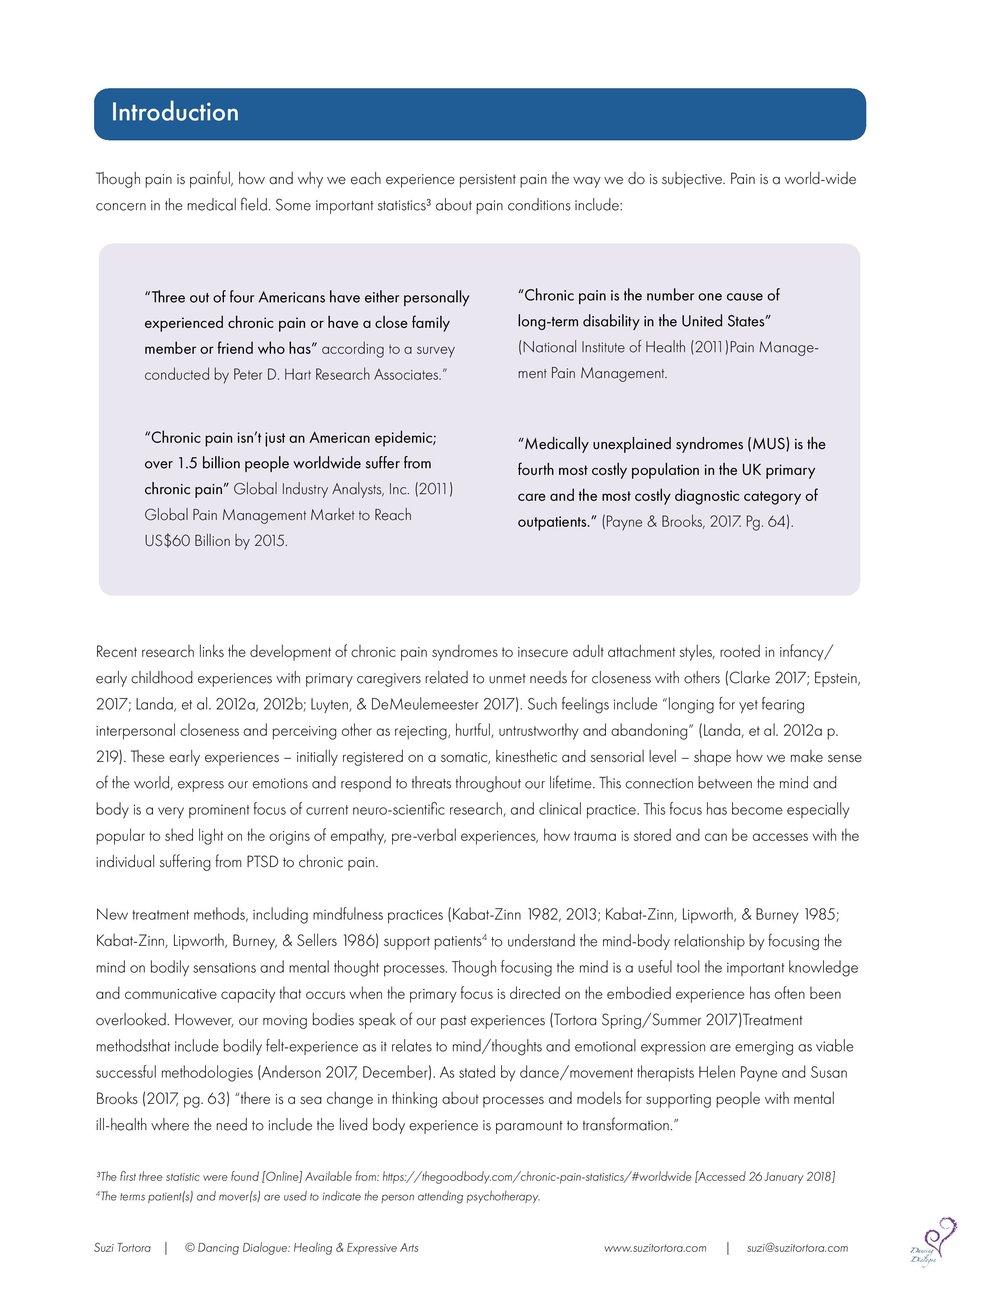 SD_PDFdownload_v3-page-003.jpg